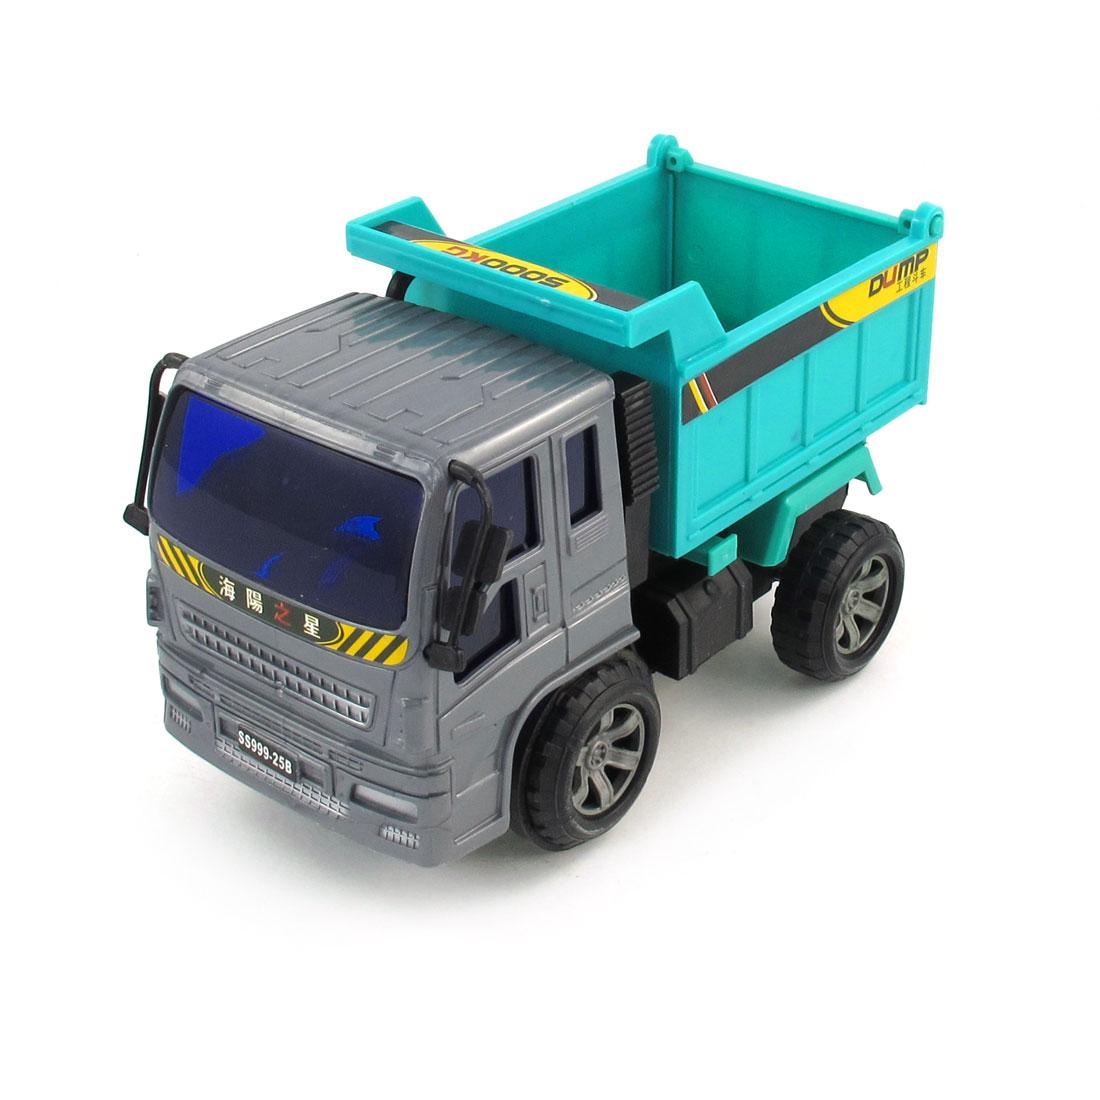 Child Plastic Dump Truck Vehicle Car Model Toy Dark Gray Green